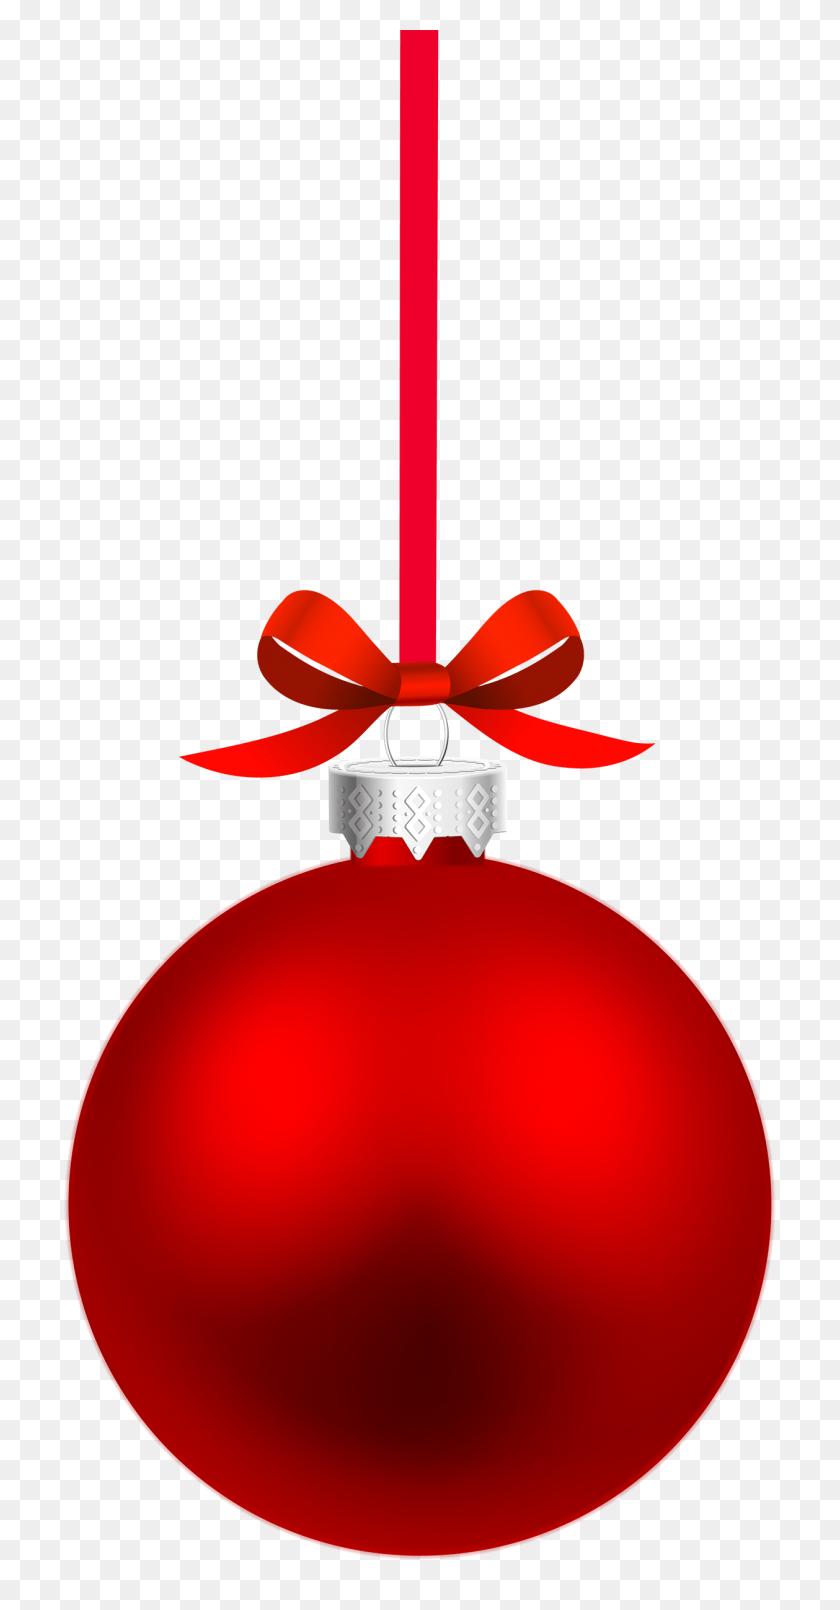 Christmas Ball Png Transparent Christmas Ball Images Tree Top View